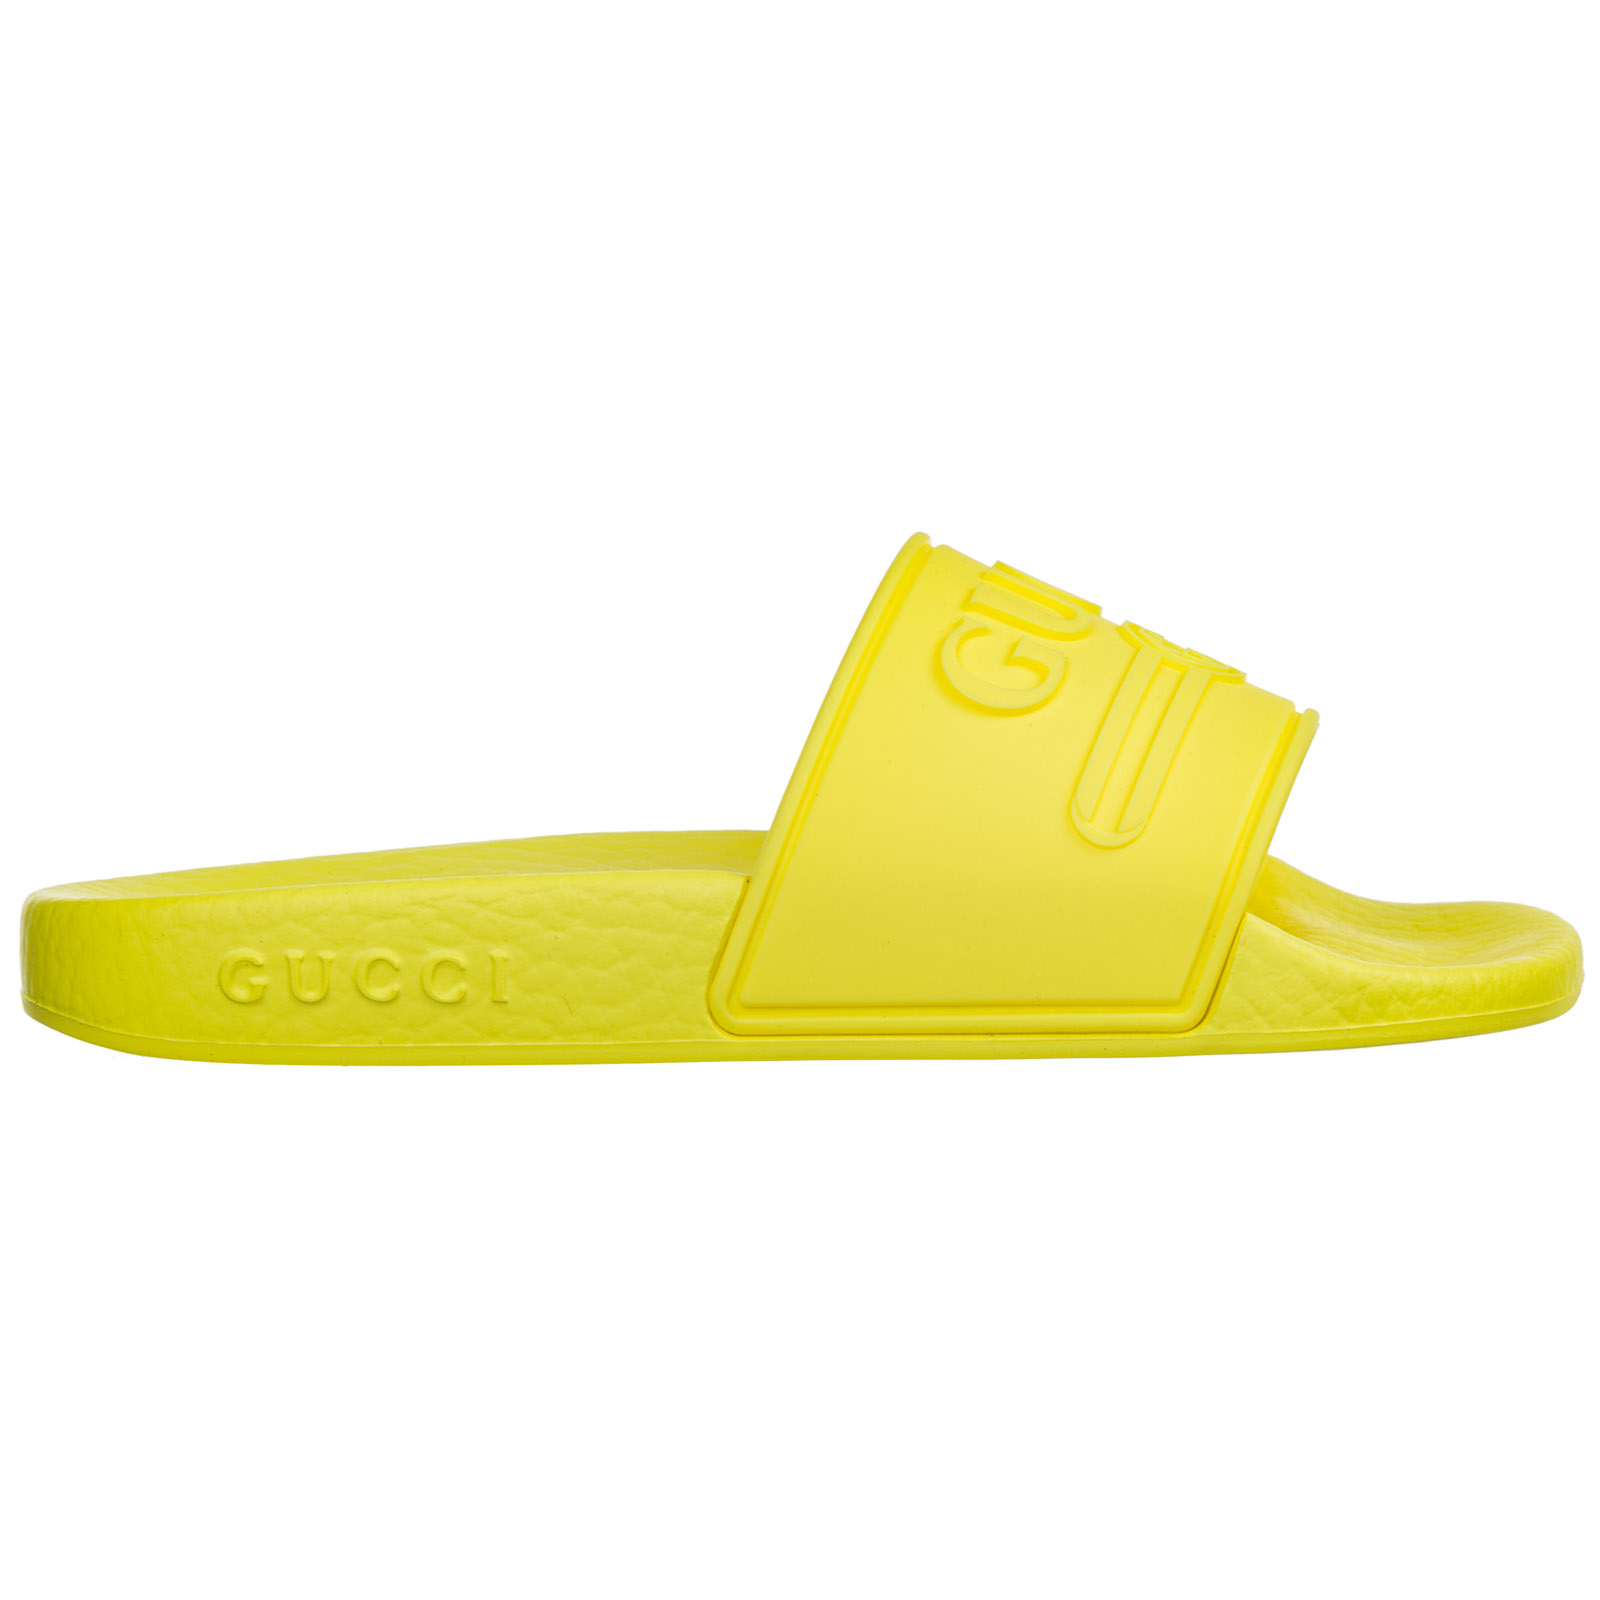 baa36ed1e6e Girls Slippers in Yellow